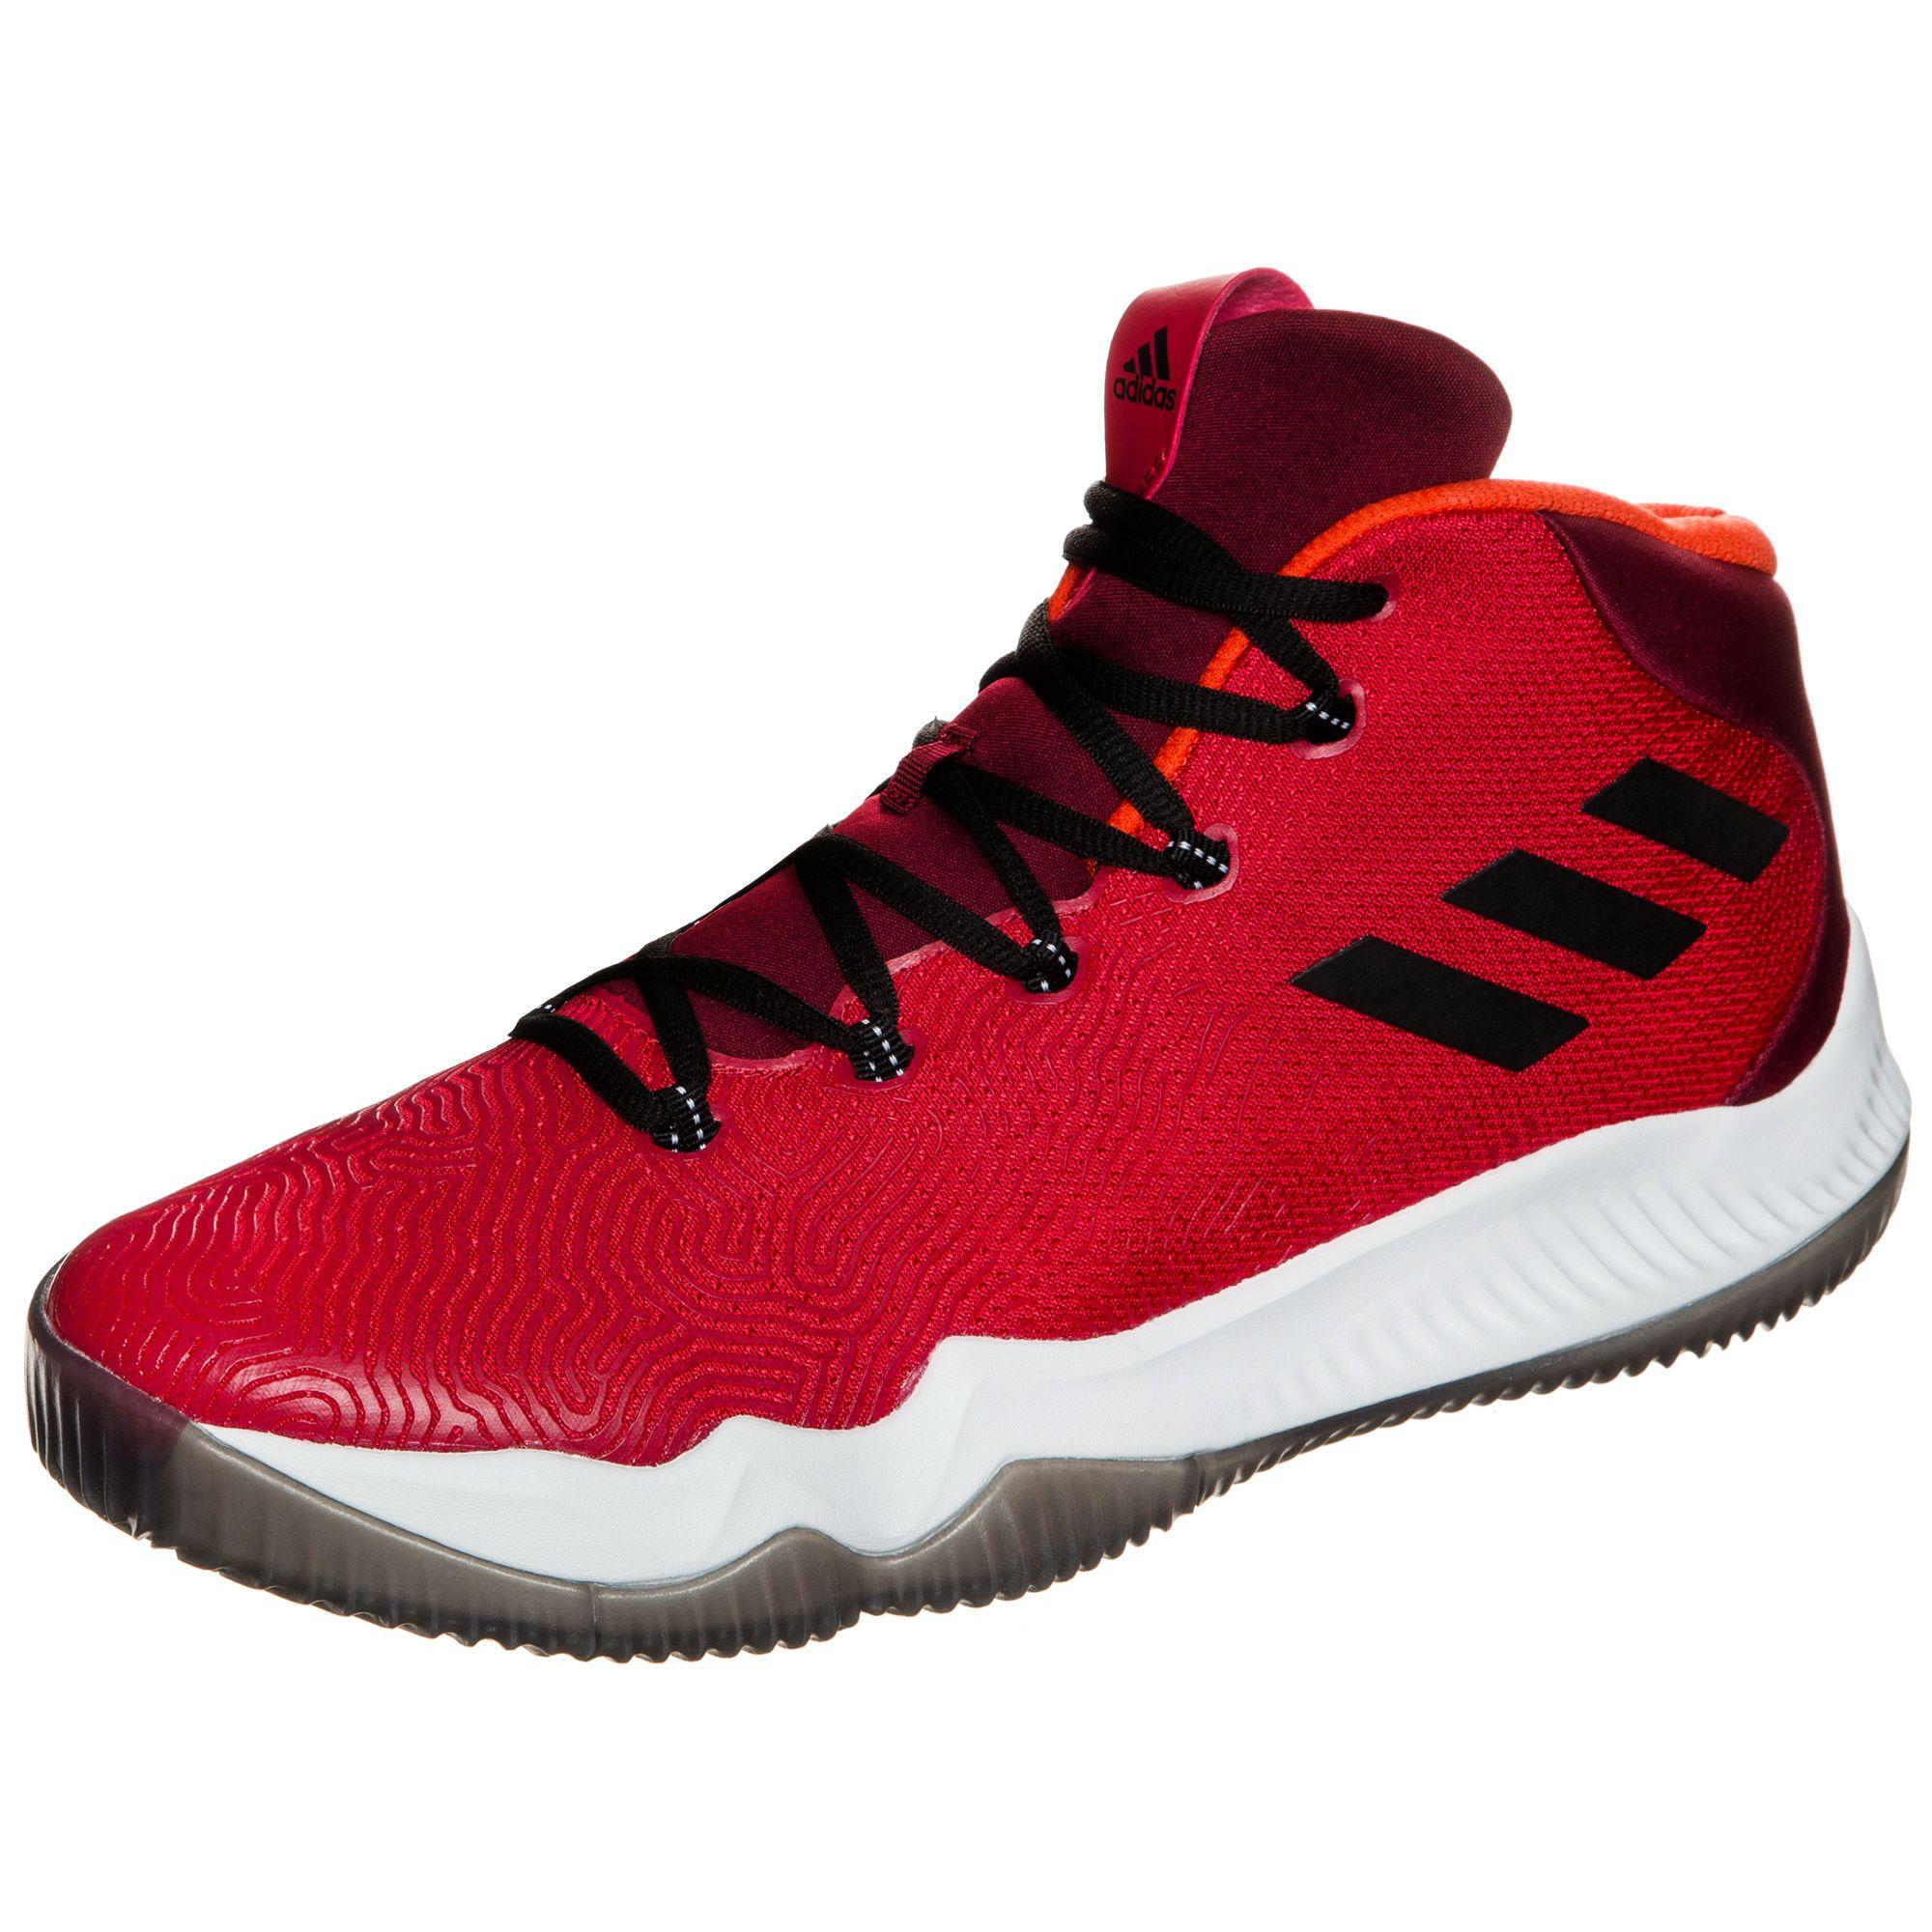 ADIDAS PERFORMANCE adidas Performance Crazy Hustle Basketballschuh Herren